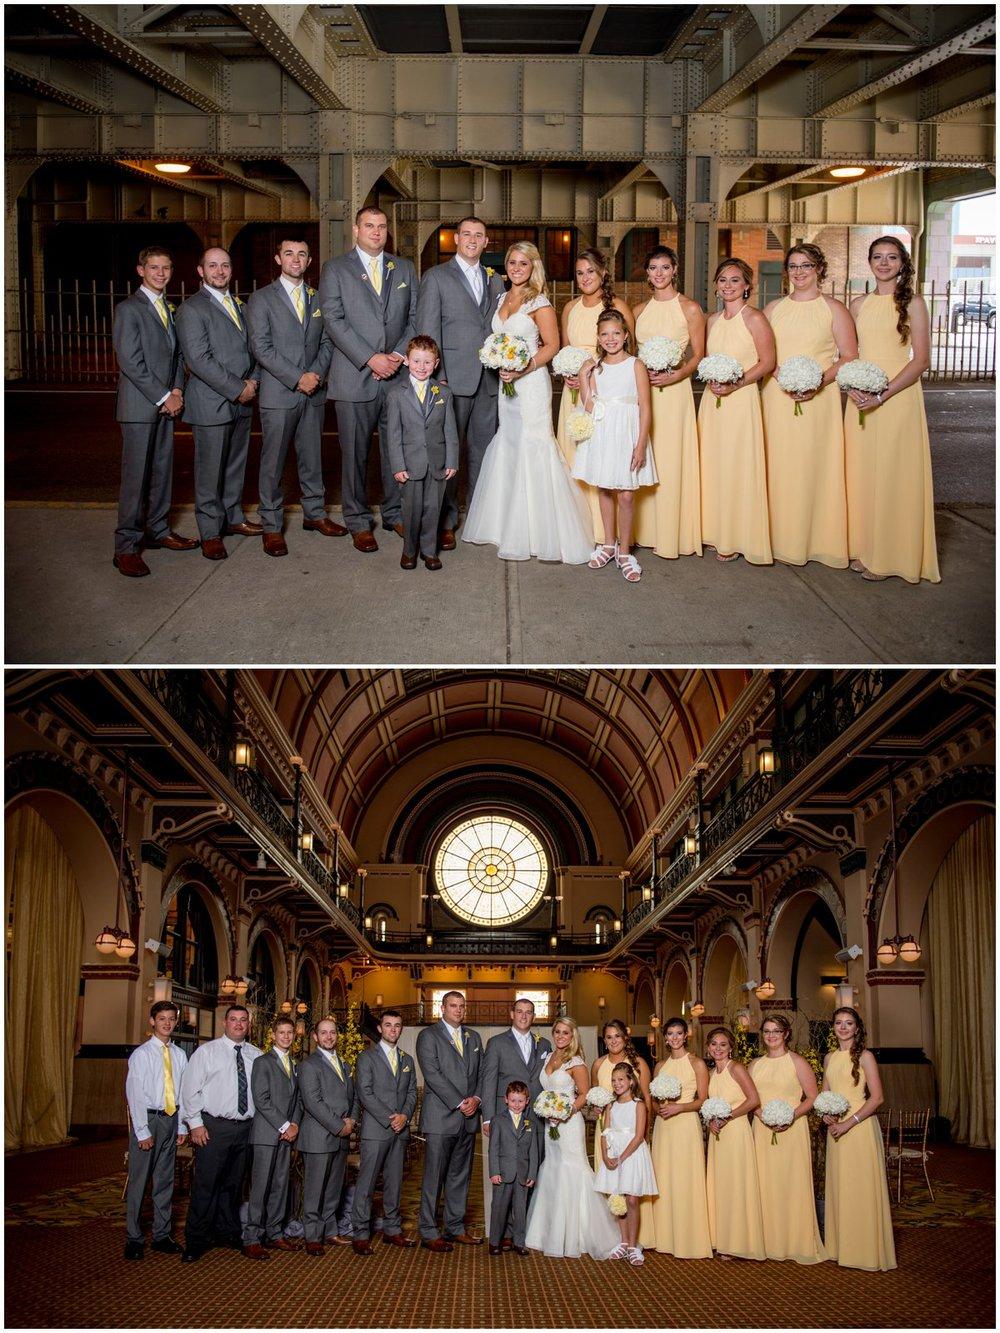 Indianapolis union station wedding photos-011.jpg